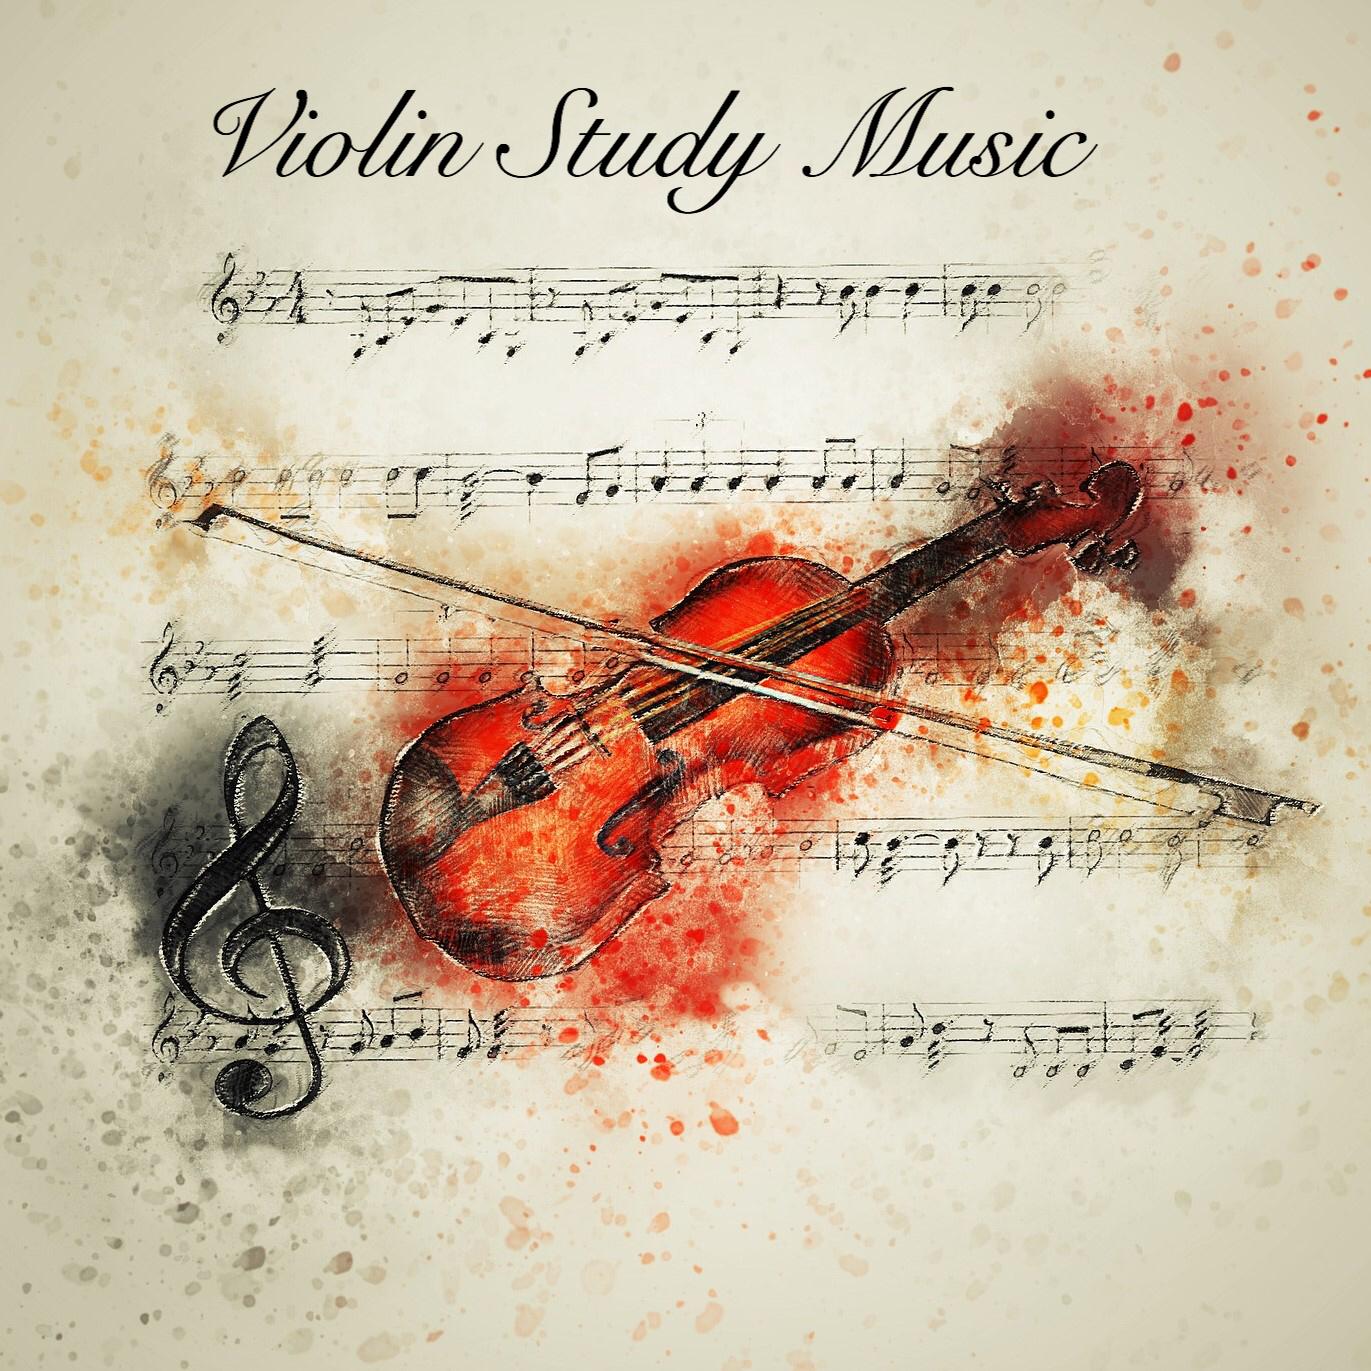 Violin Study Music - Violin Concerto No 1 Mp3 Download   Music2relax com